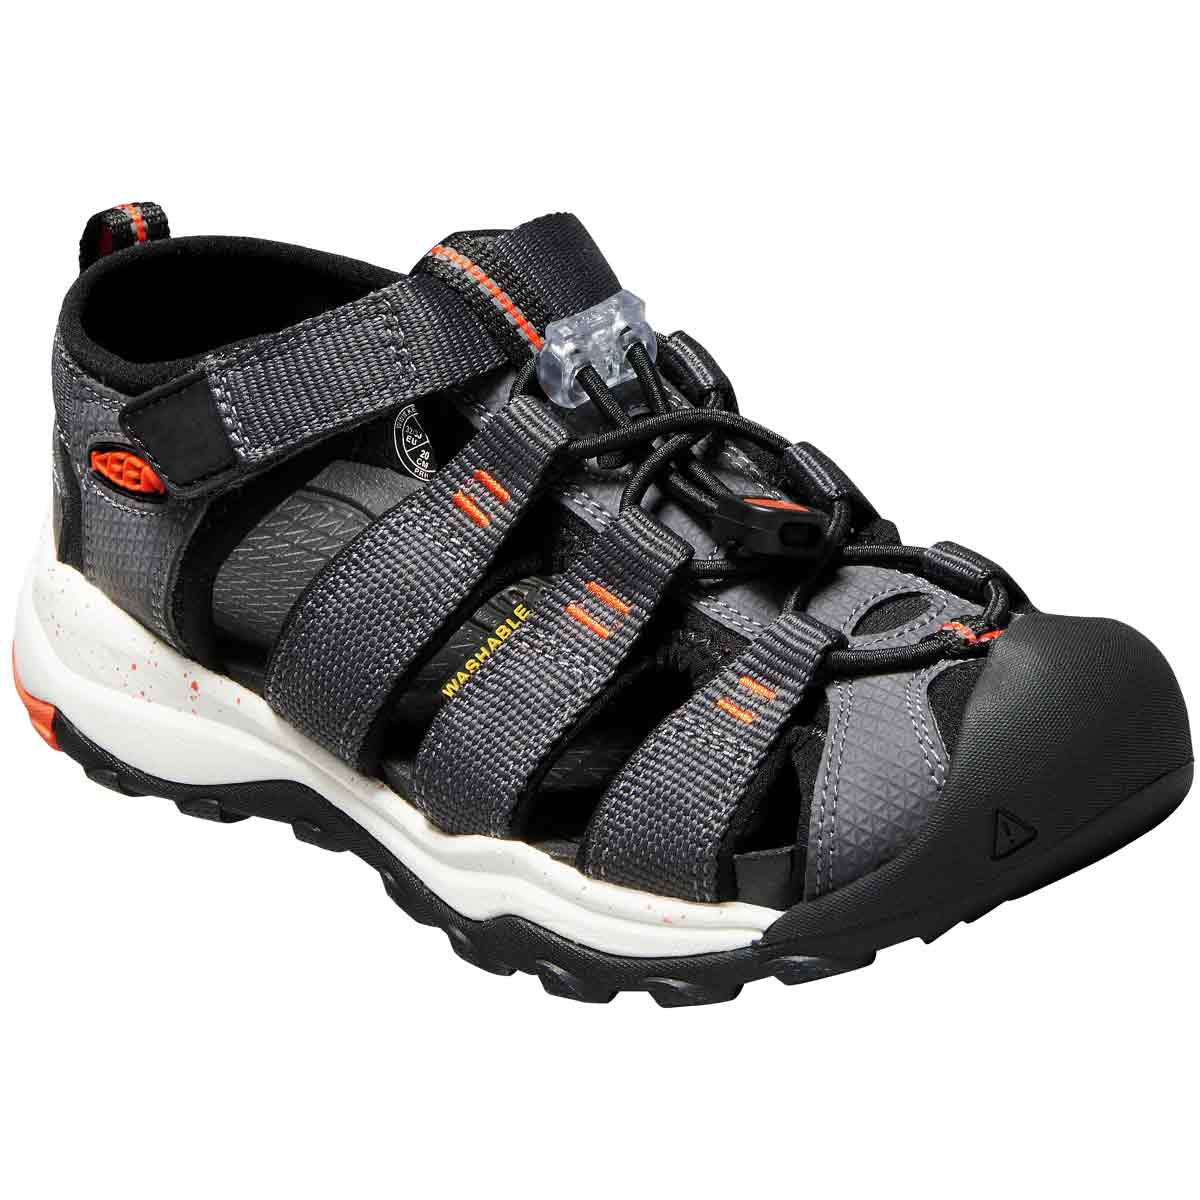 Keen Kids' Newport Neo H2 Sandal - Black, 1